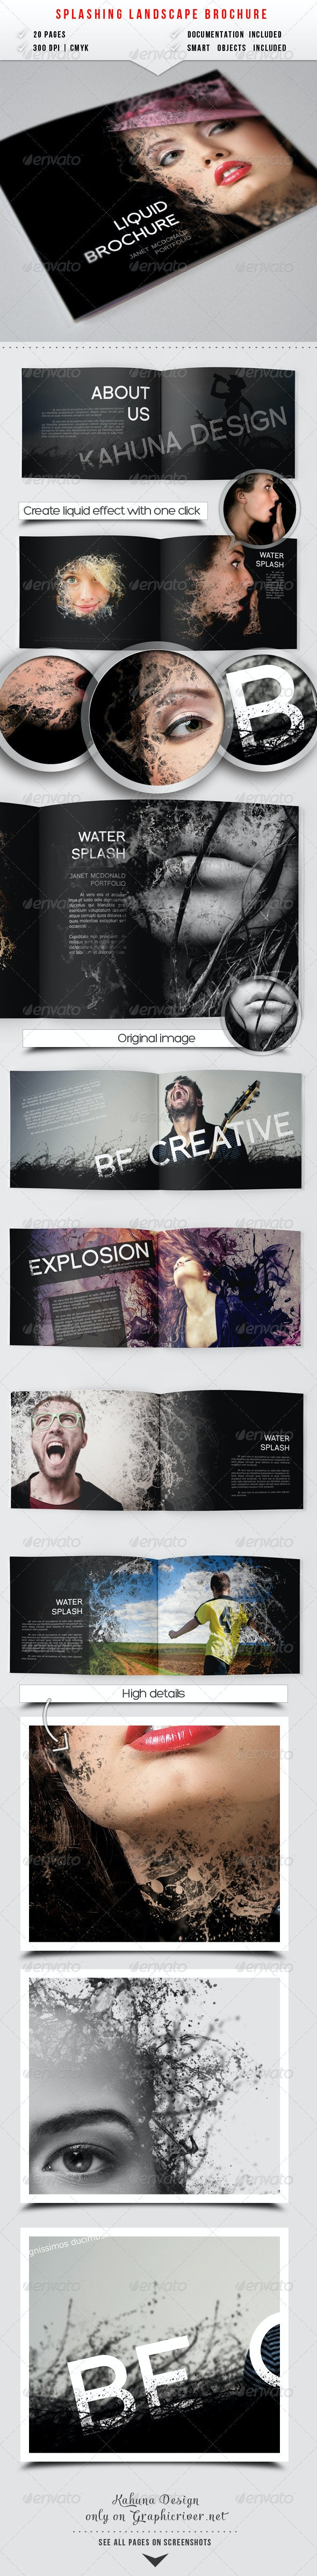 Splashing Landscape Album - Photo Albums Print Templates